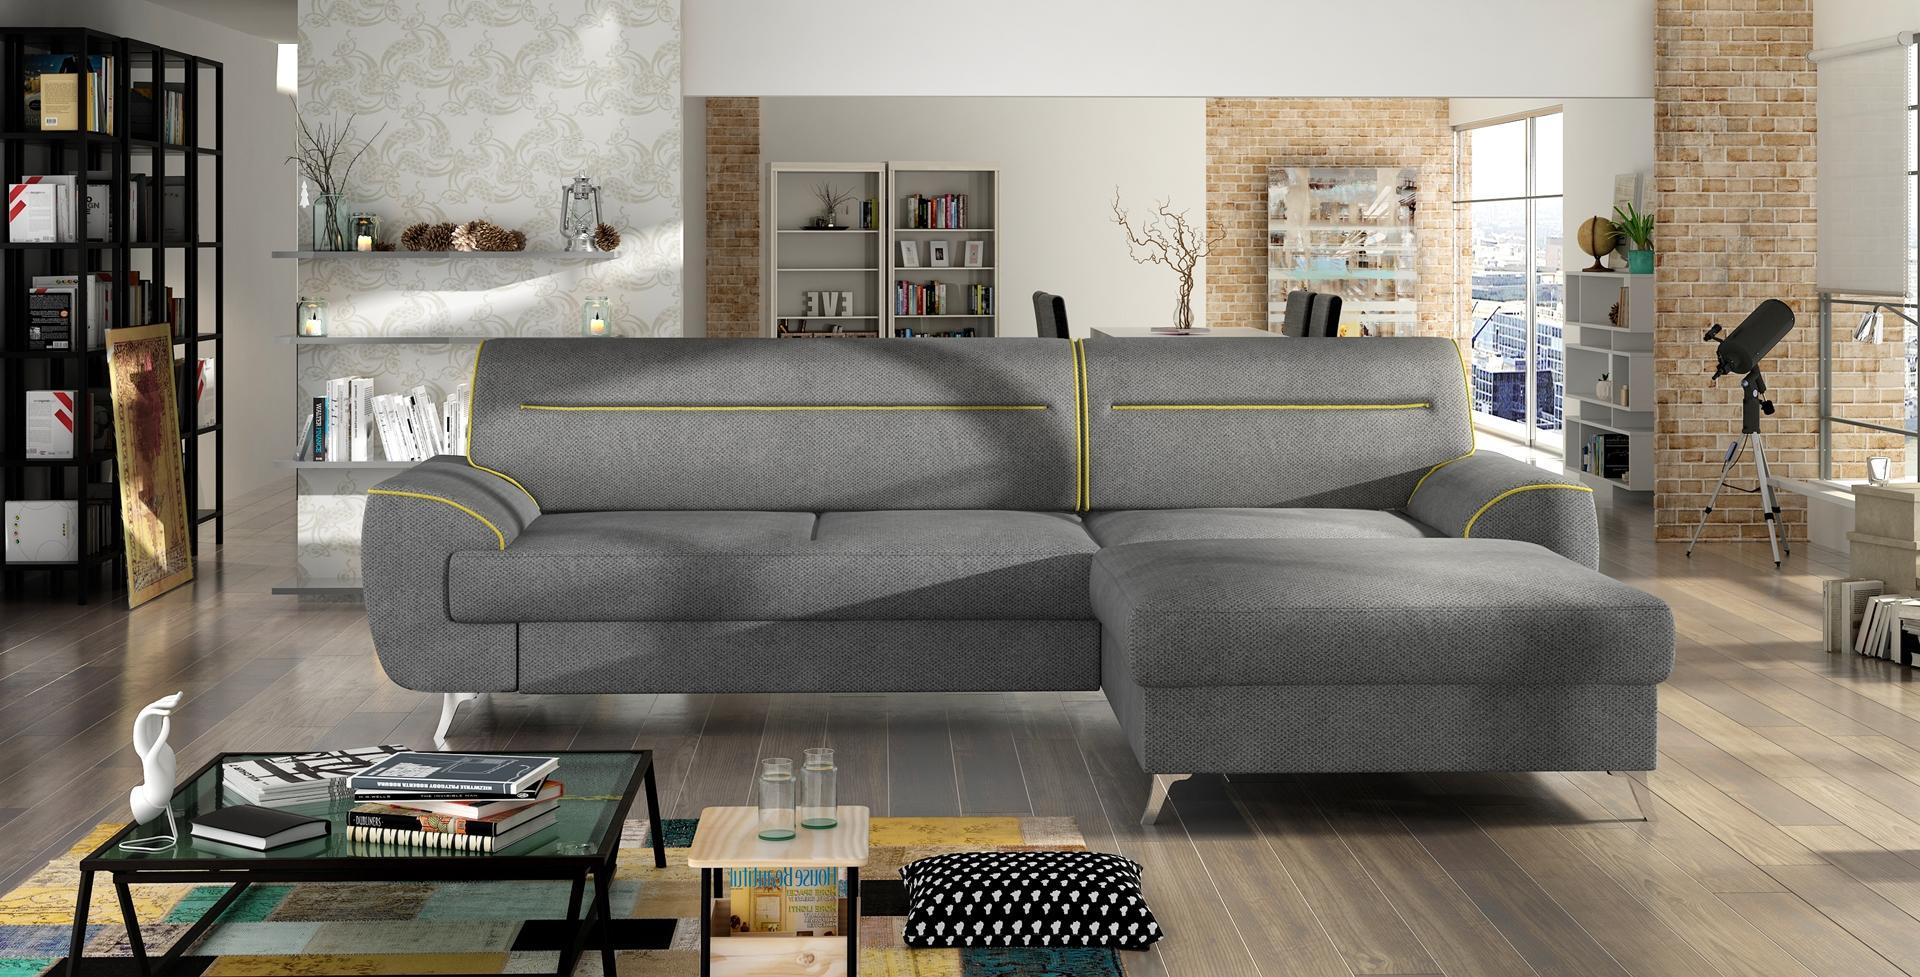 Etagenbett Interio : Sofa schlafsofa designer mit bettfunktion bettkasten ecksofa